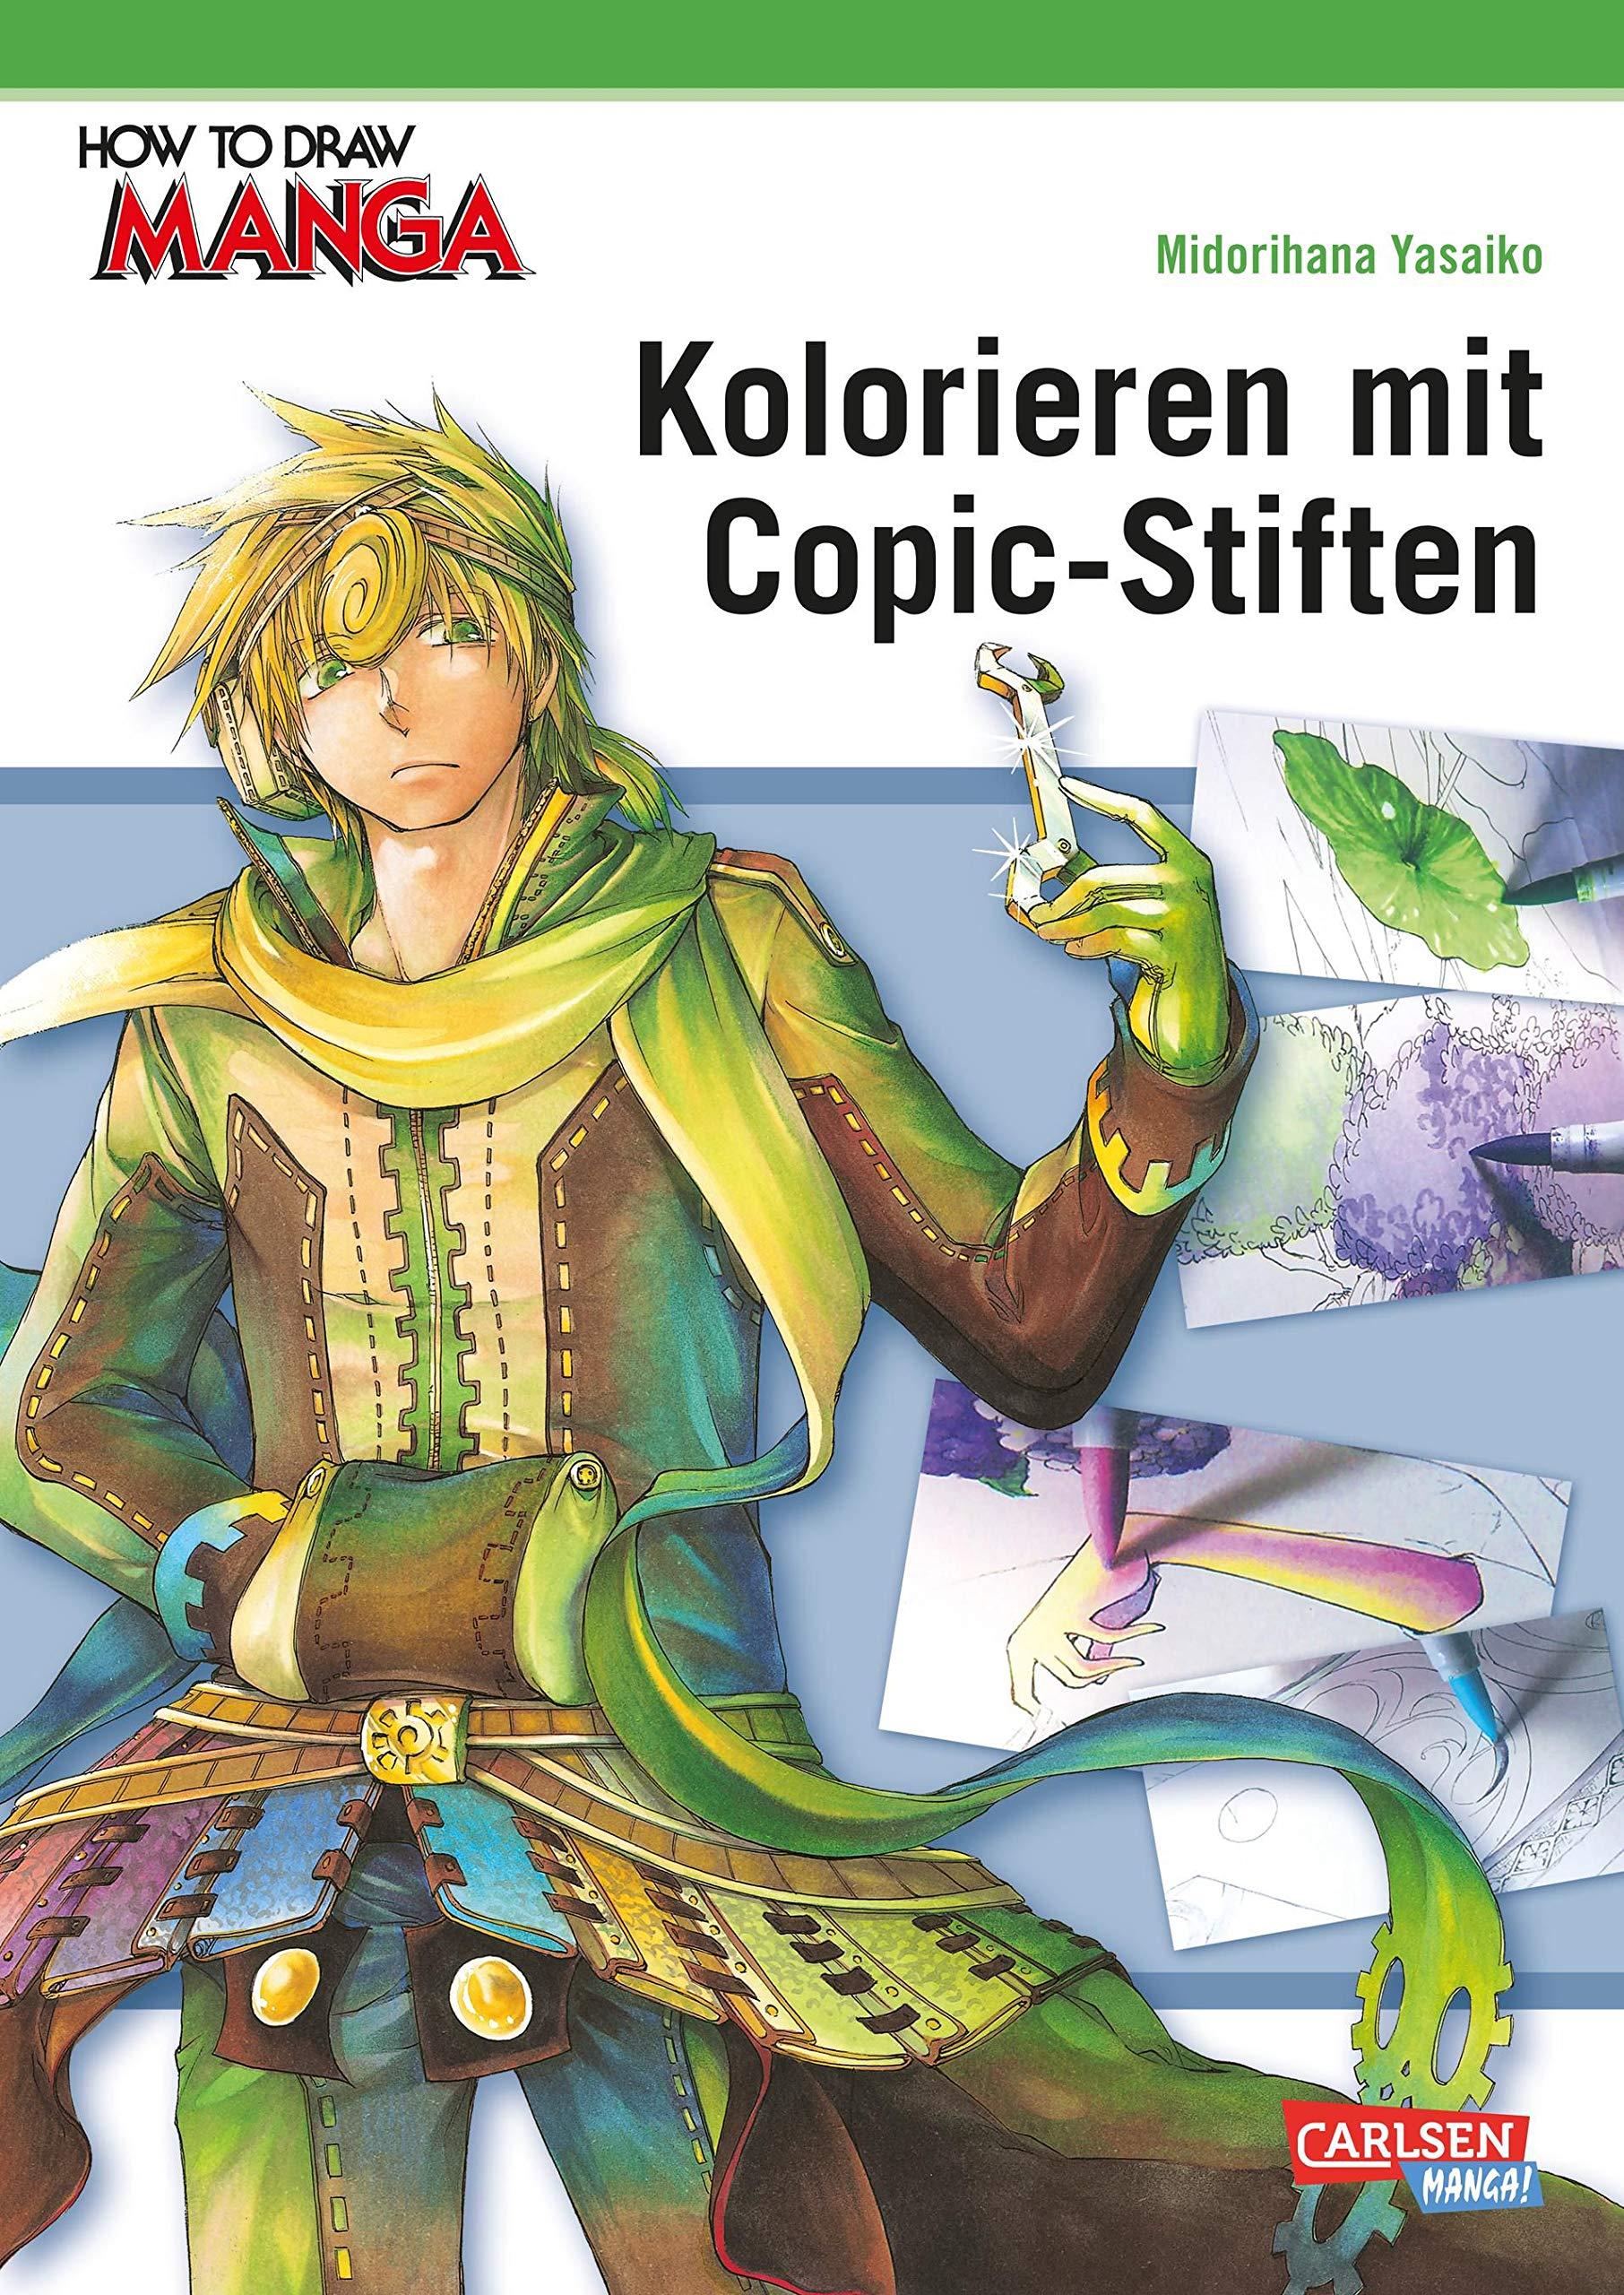 How To Draw Manga: Kolorieren mit Copic-Stiften Taschenbuch – 20. März 2018 Midorihana Yasaiko Hiro Yamada Carlsen 3551739838